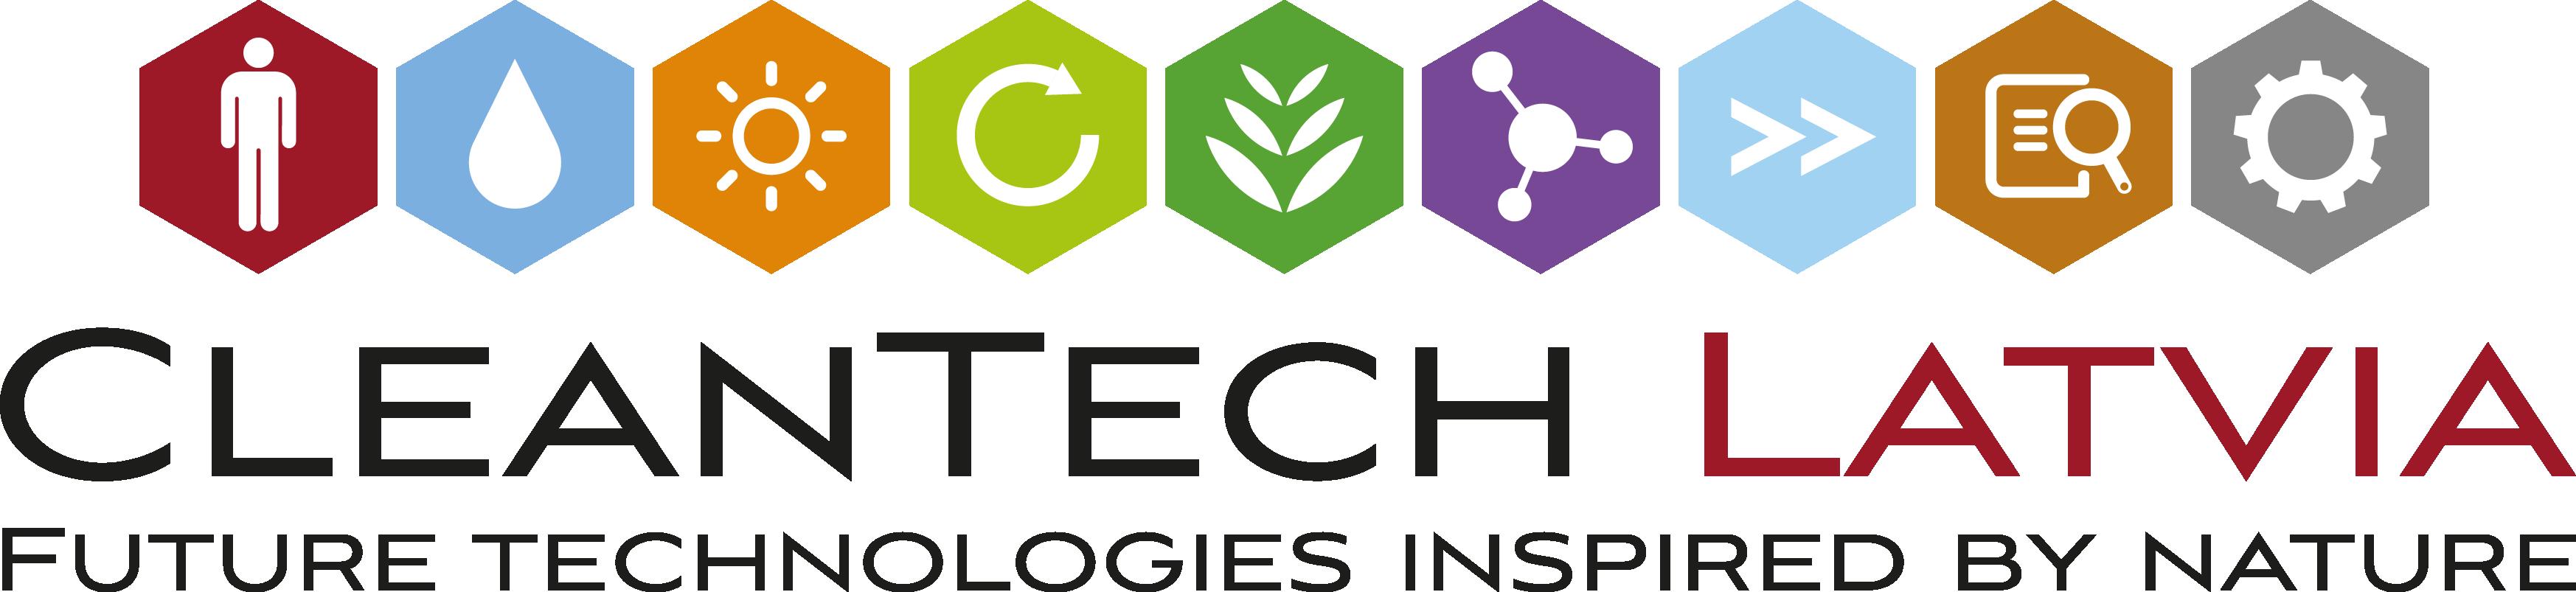 cleantech_latvia